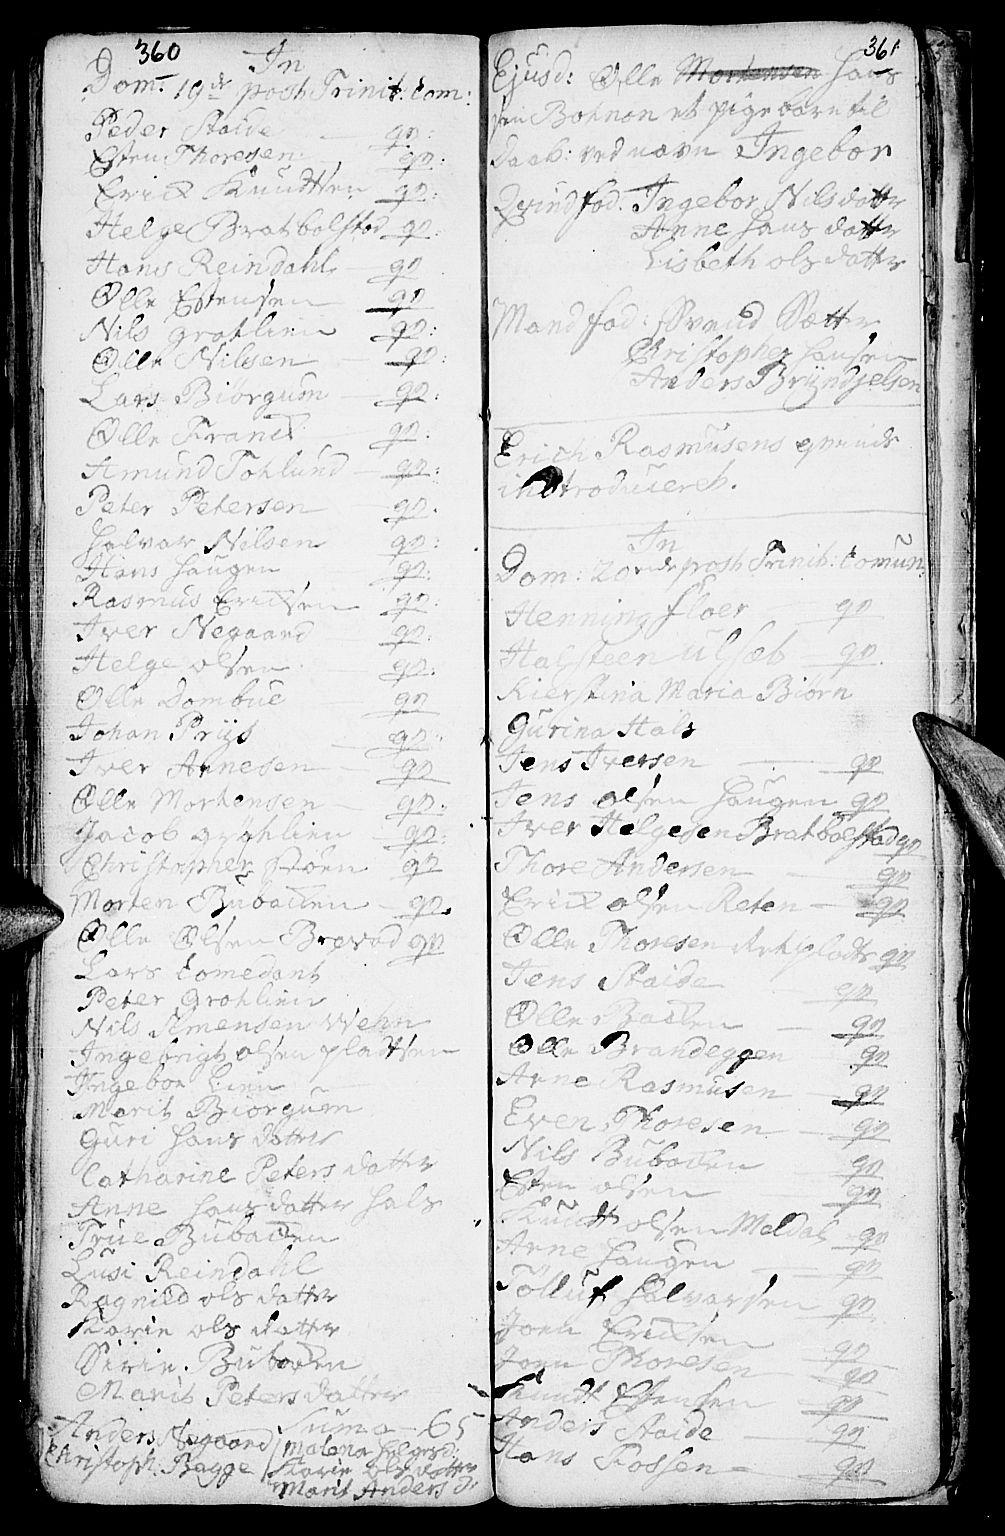 SAH, Kvikne prestekontor, Ministerialbok nr. 1, 1740-1756, s. 360-361